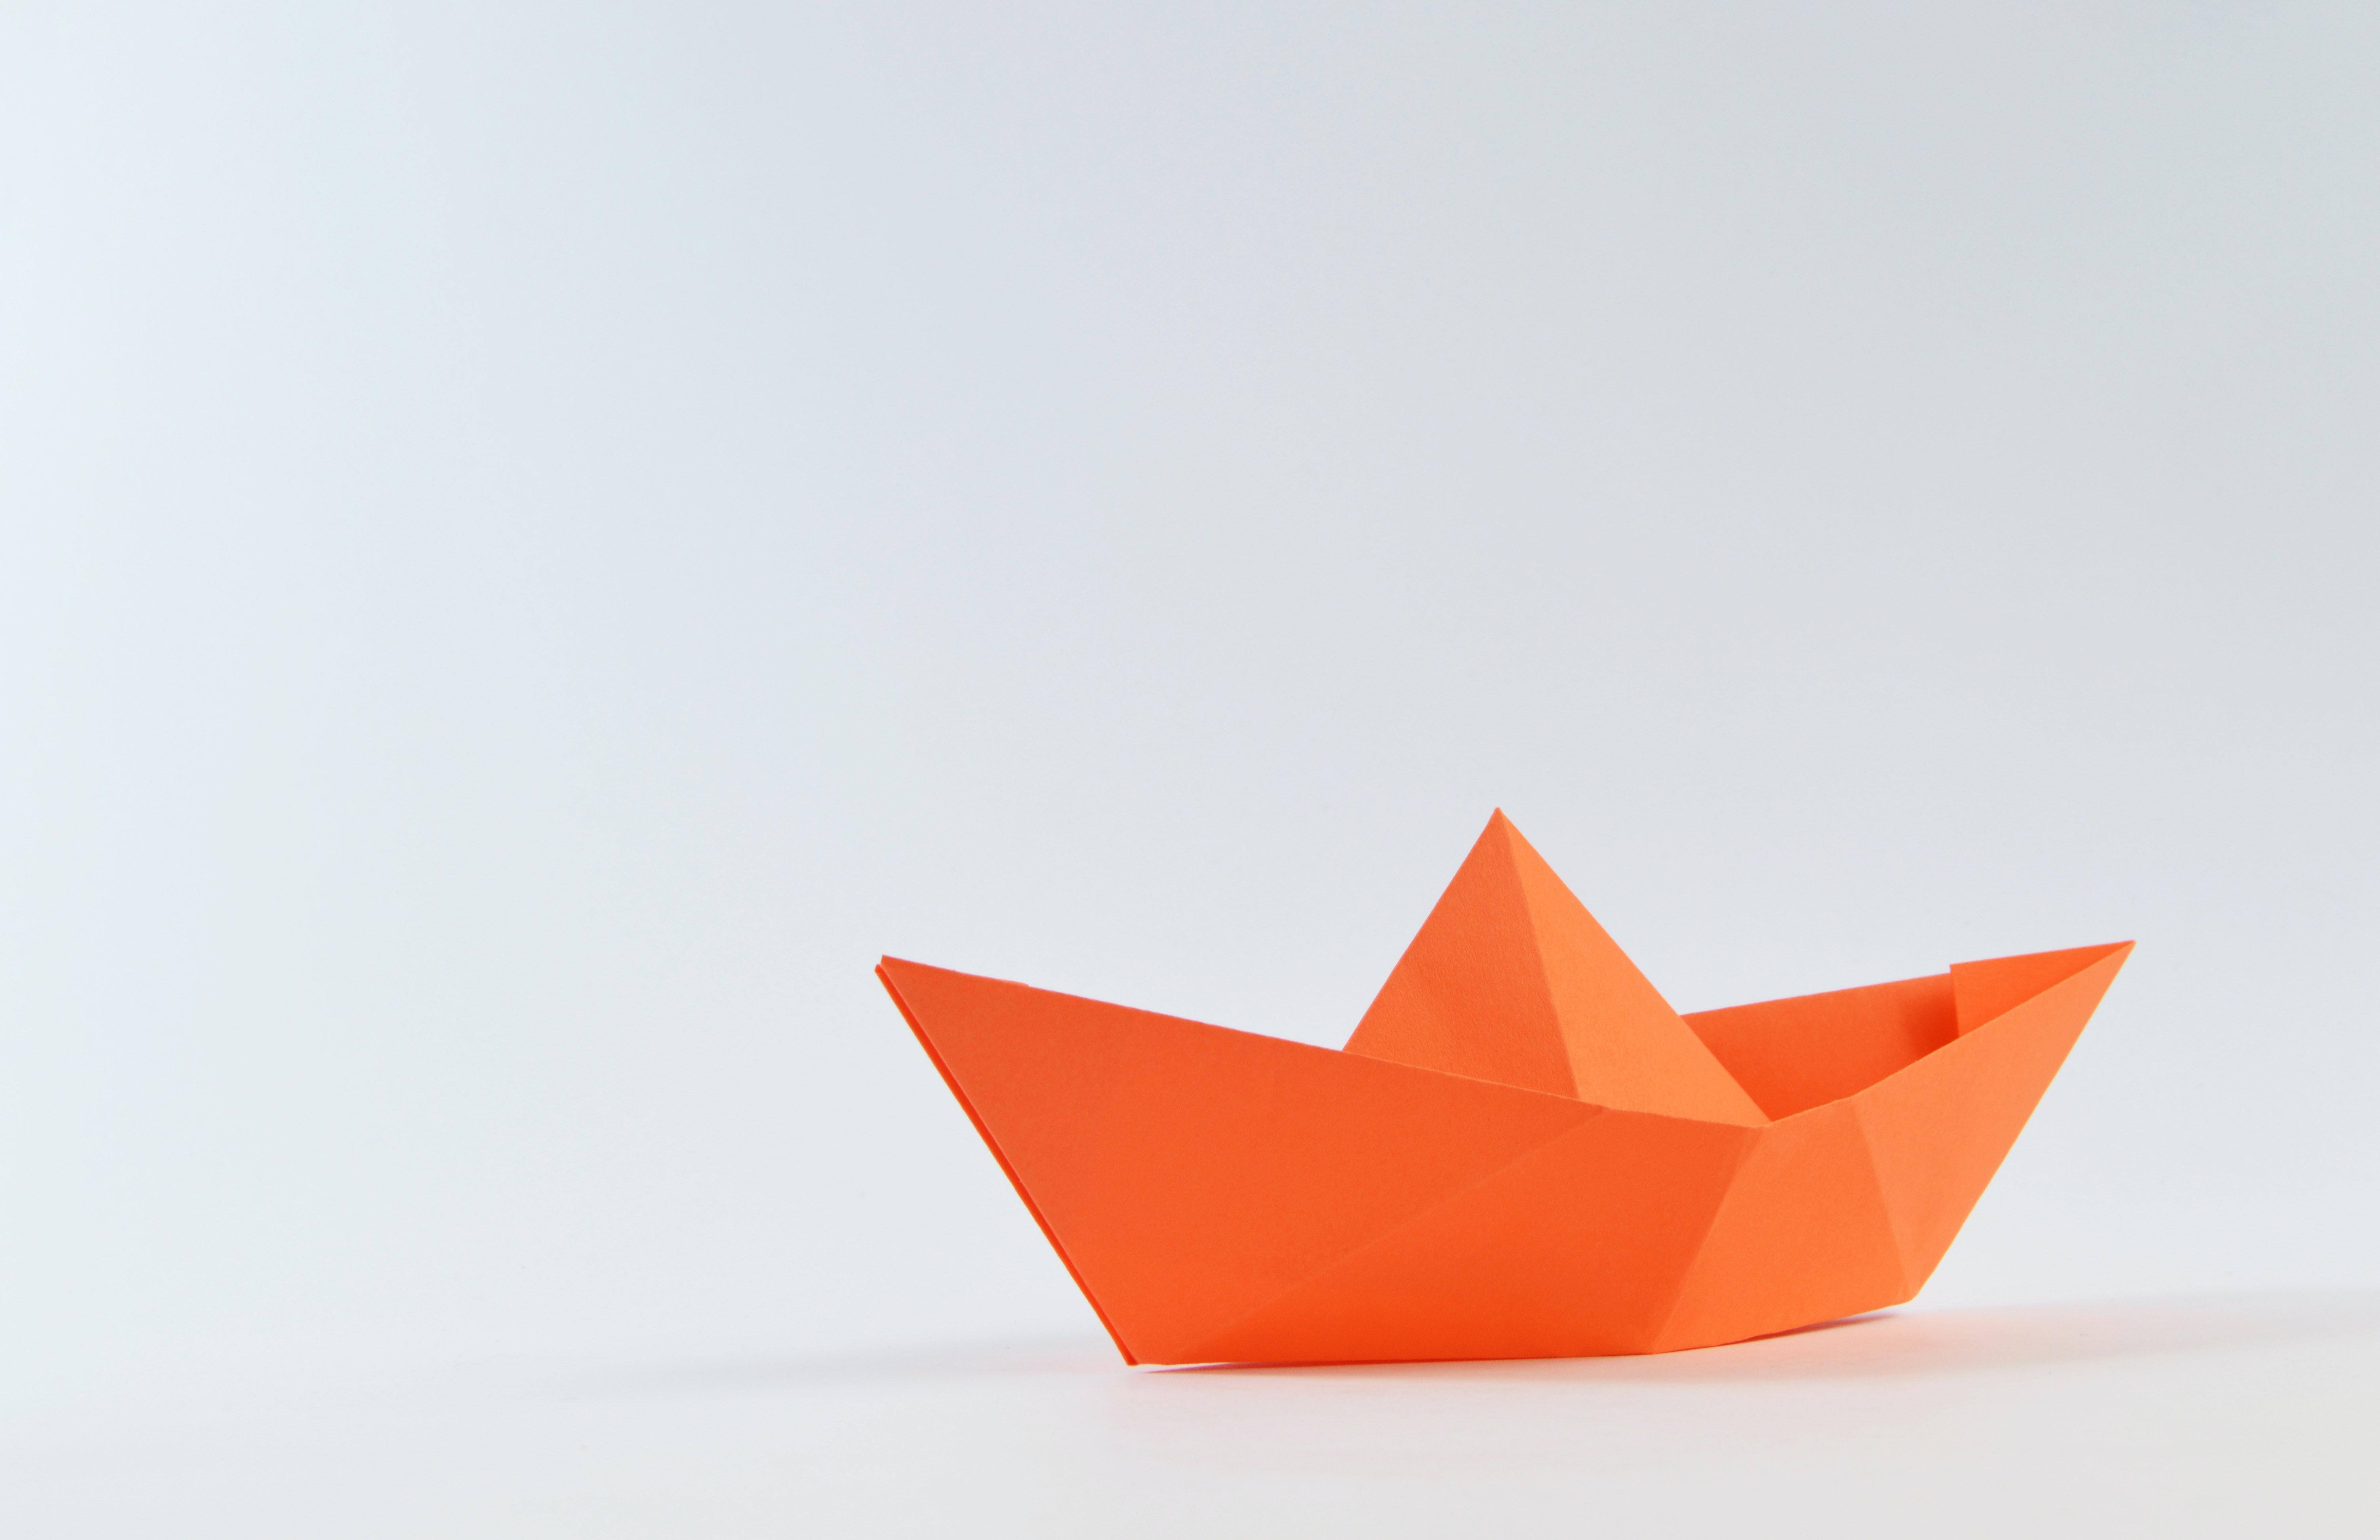 orange paper boat on white surface free stock photo